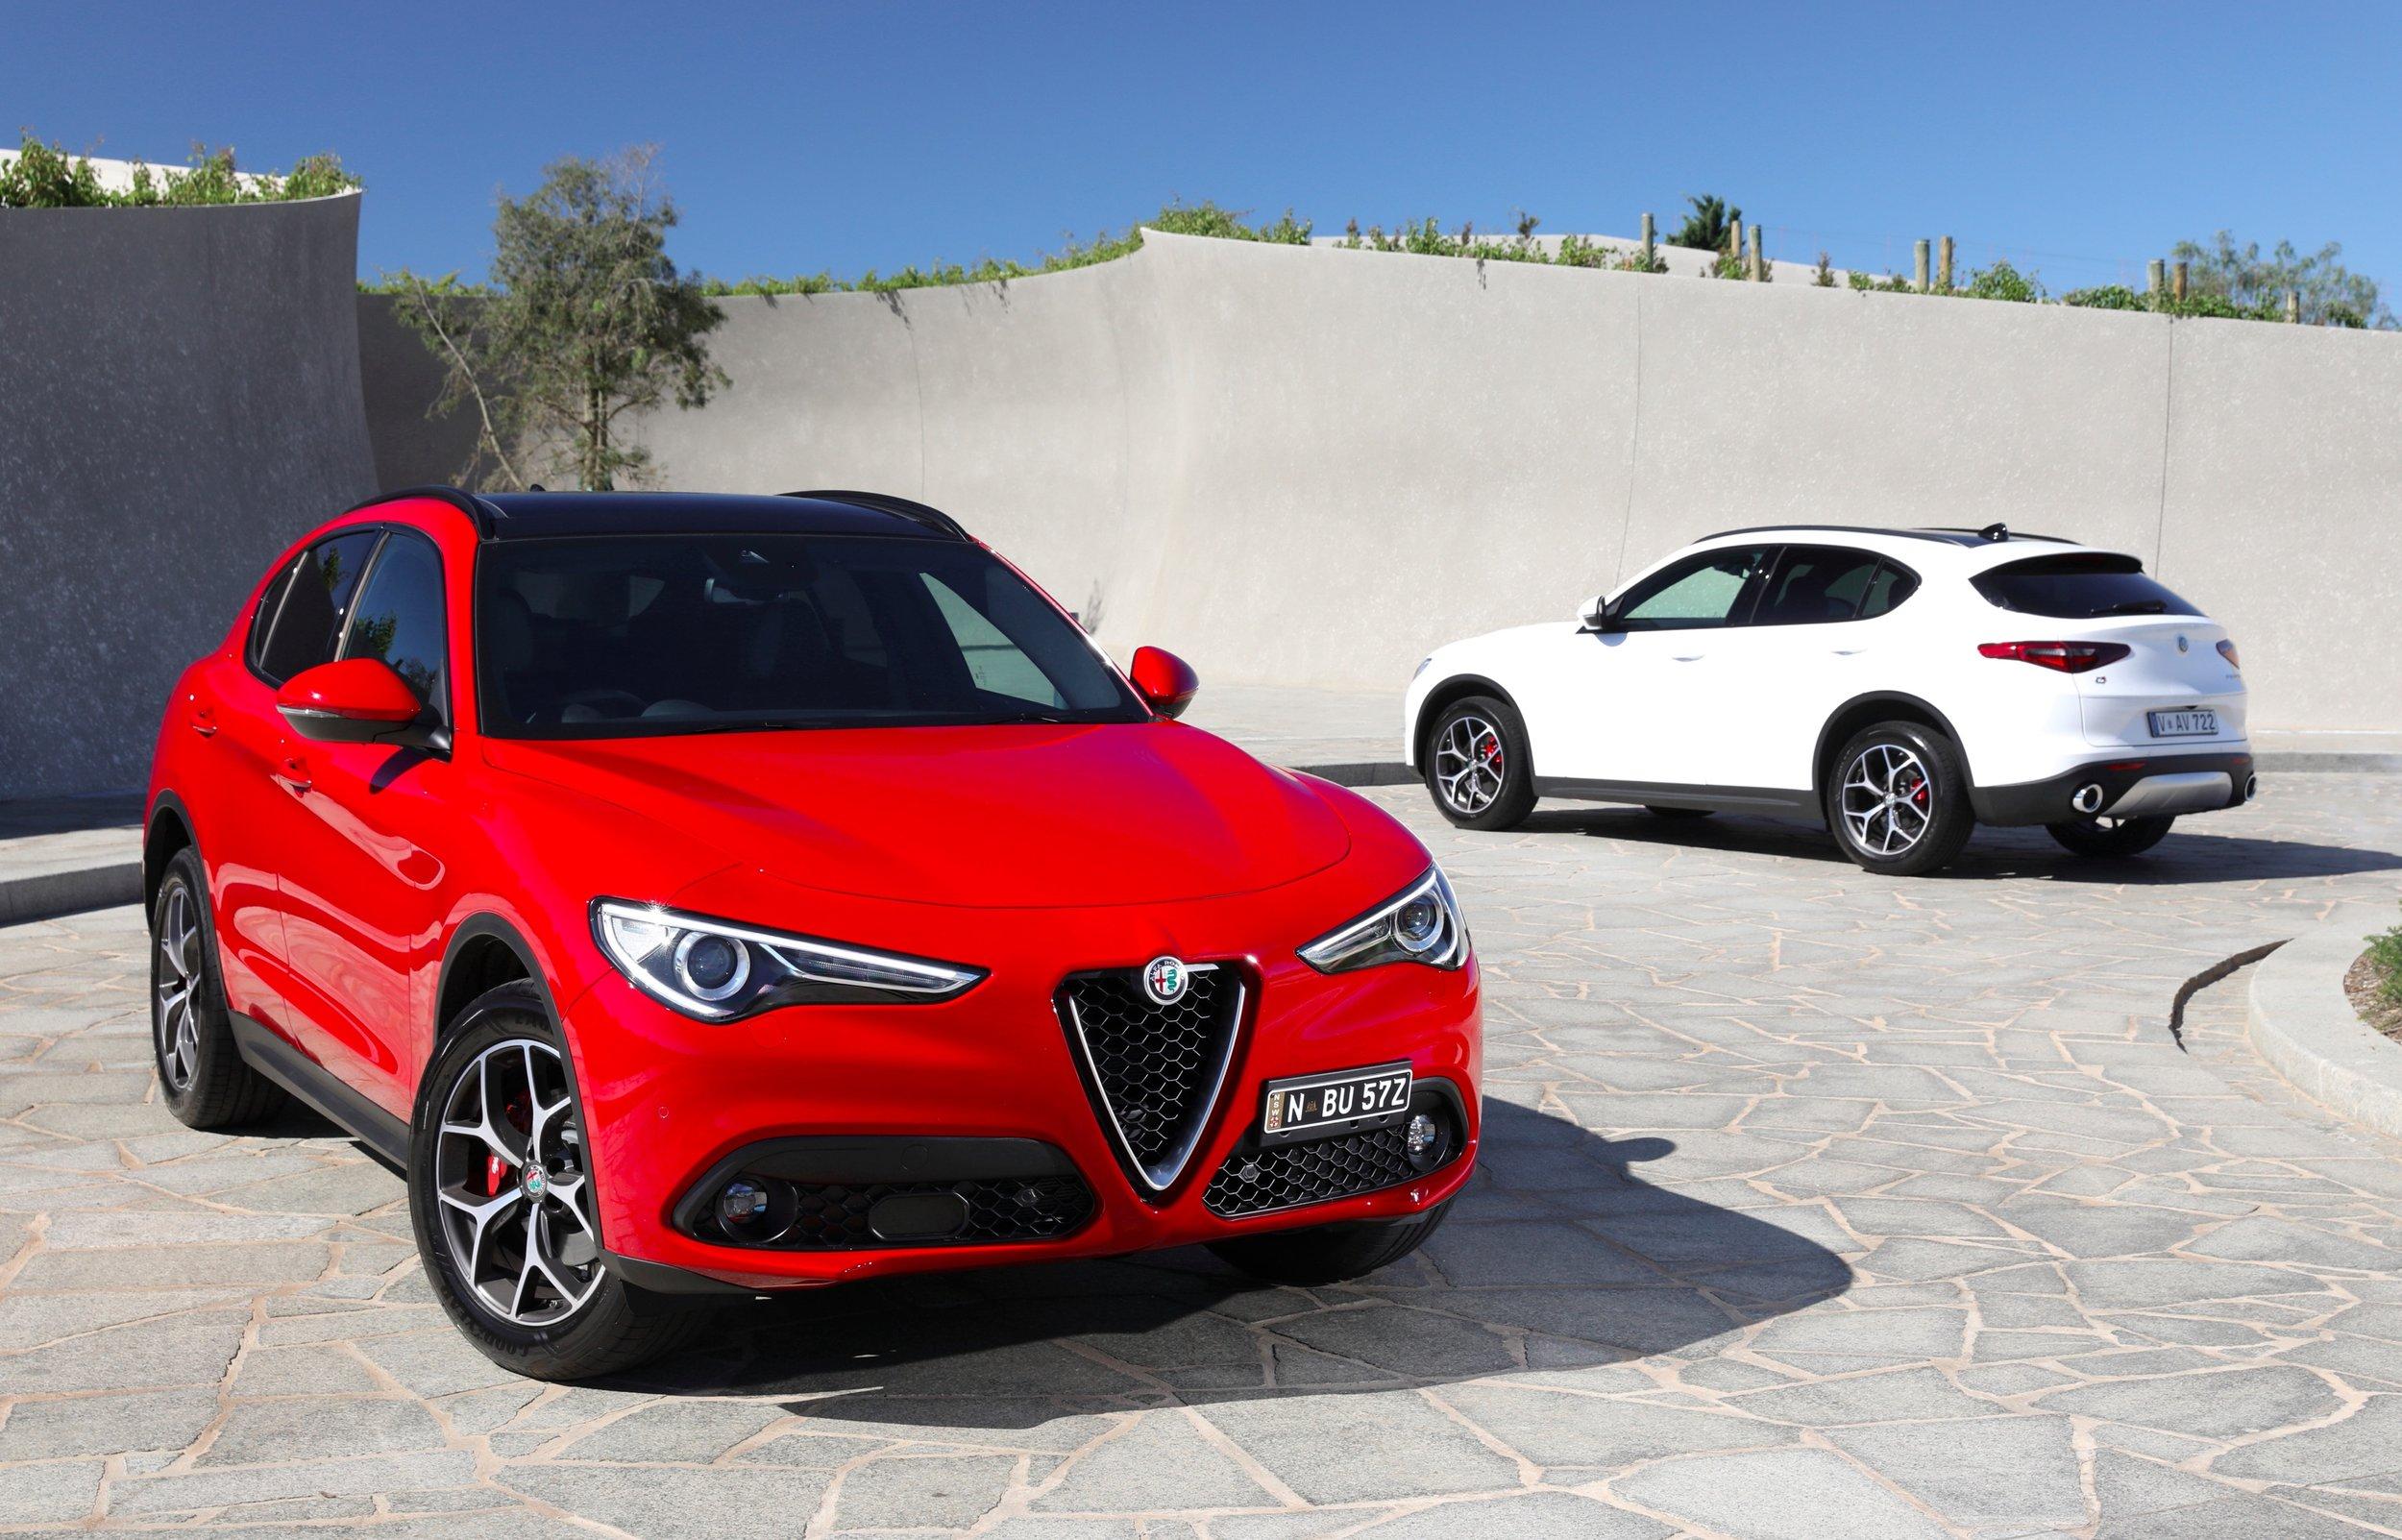 2018 Alfa Romeo Stelvio_0010.JPG